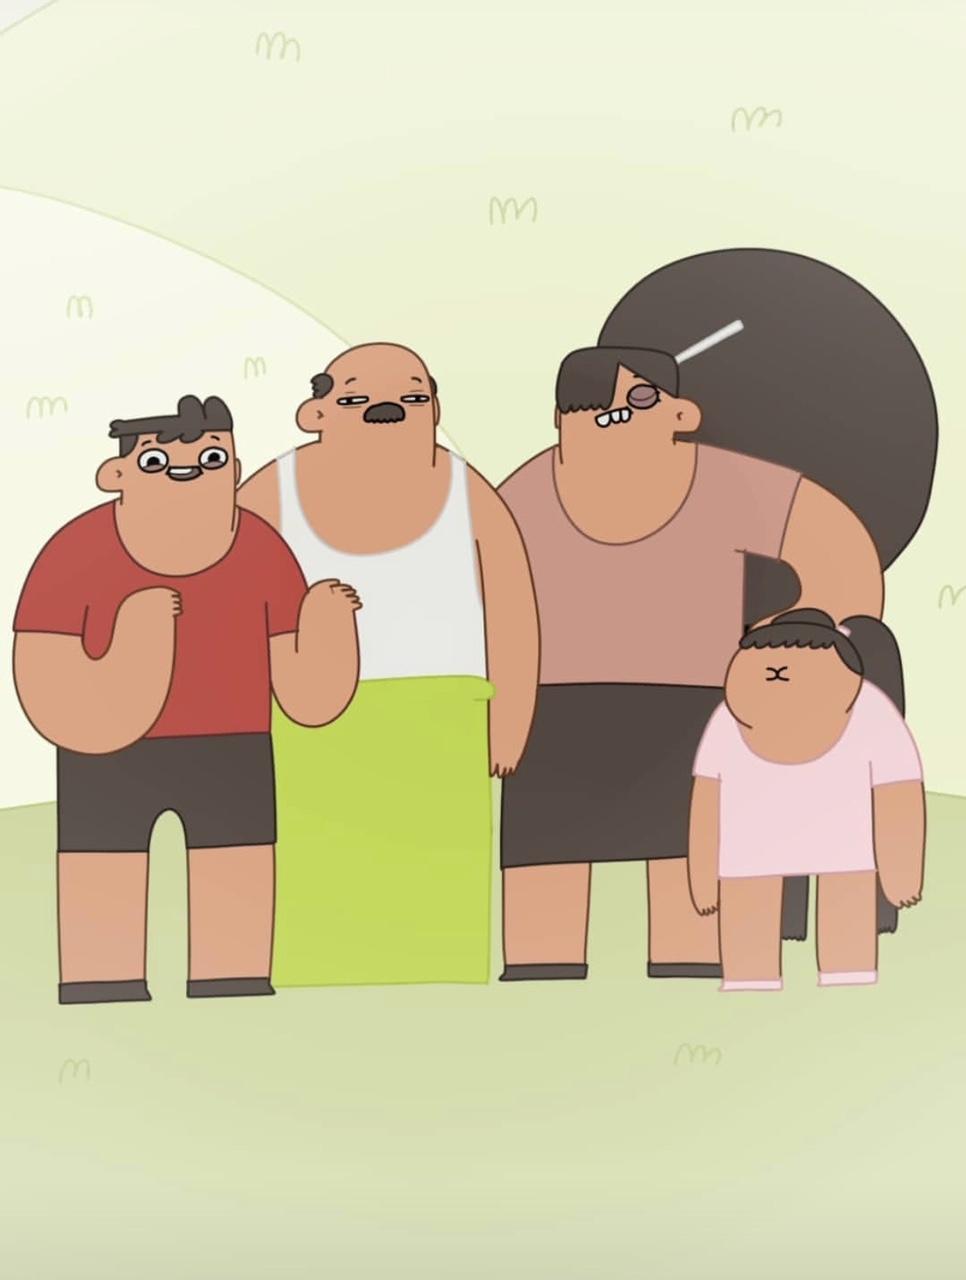 Unduh 68+ Gambar Animasi Si Nopal Terbaik Gratis